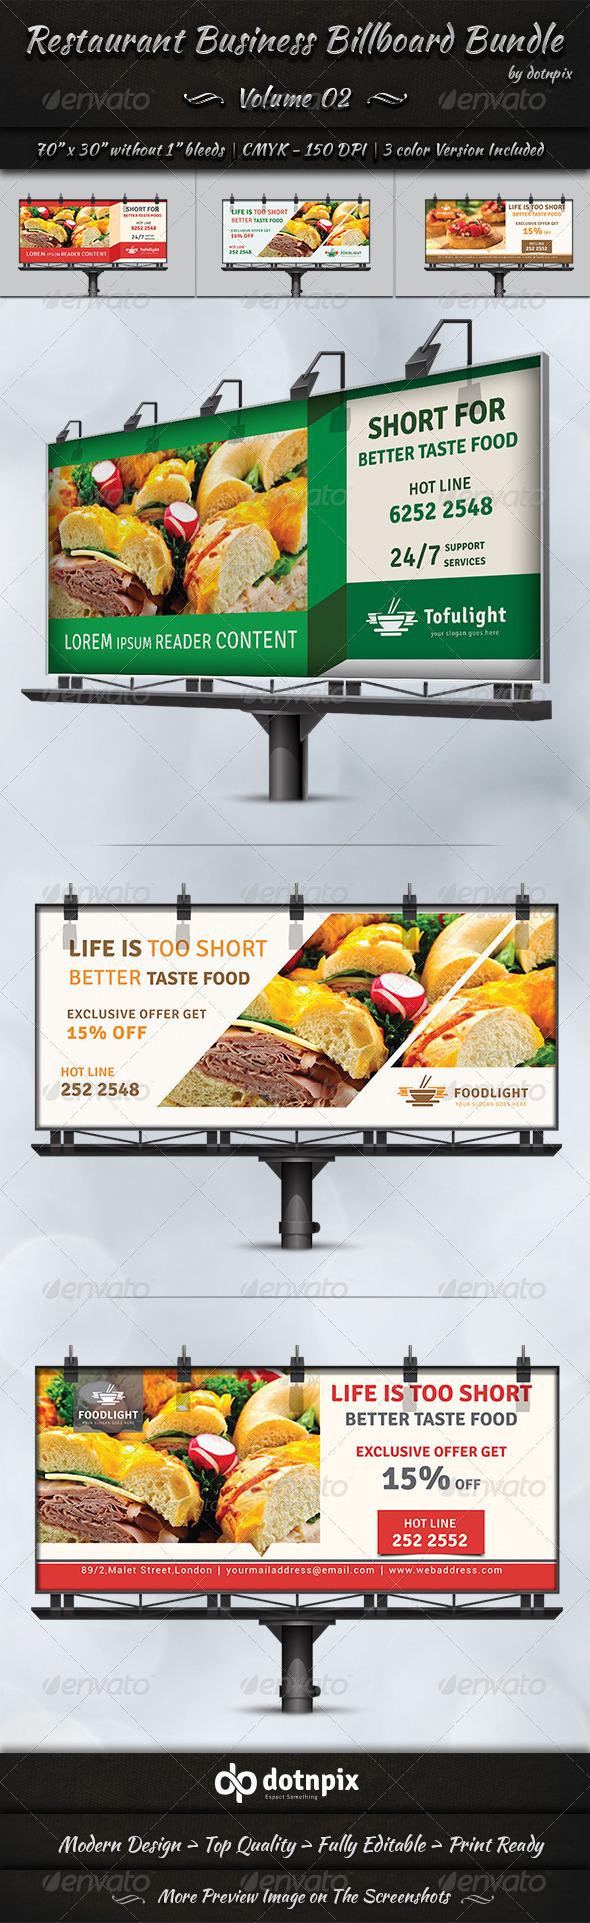 GraphicRiver Restaurant Business Billboard Bundle Volume 2 8037436